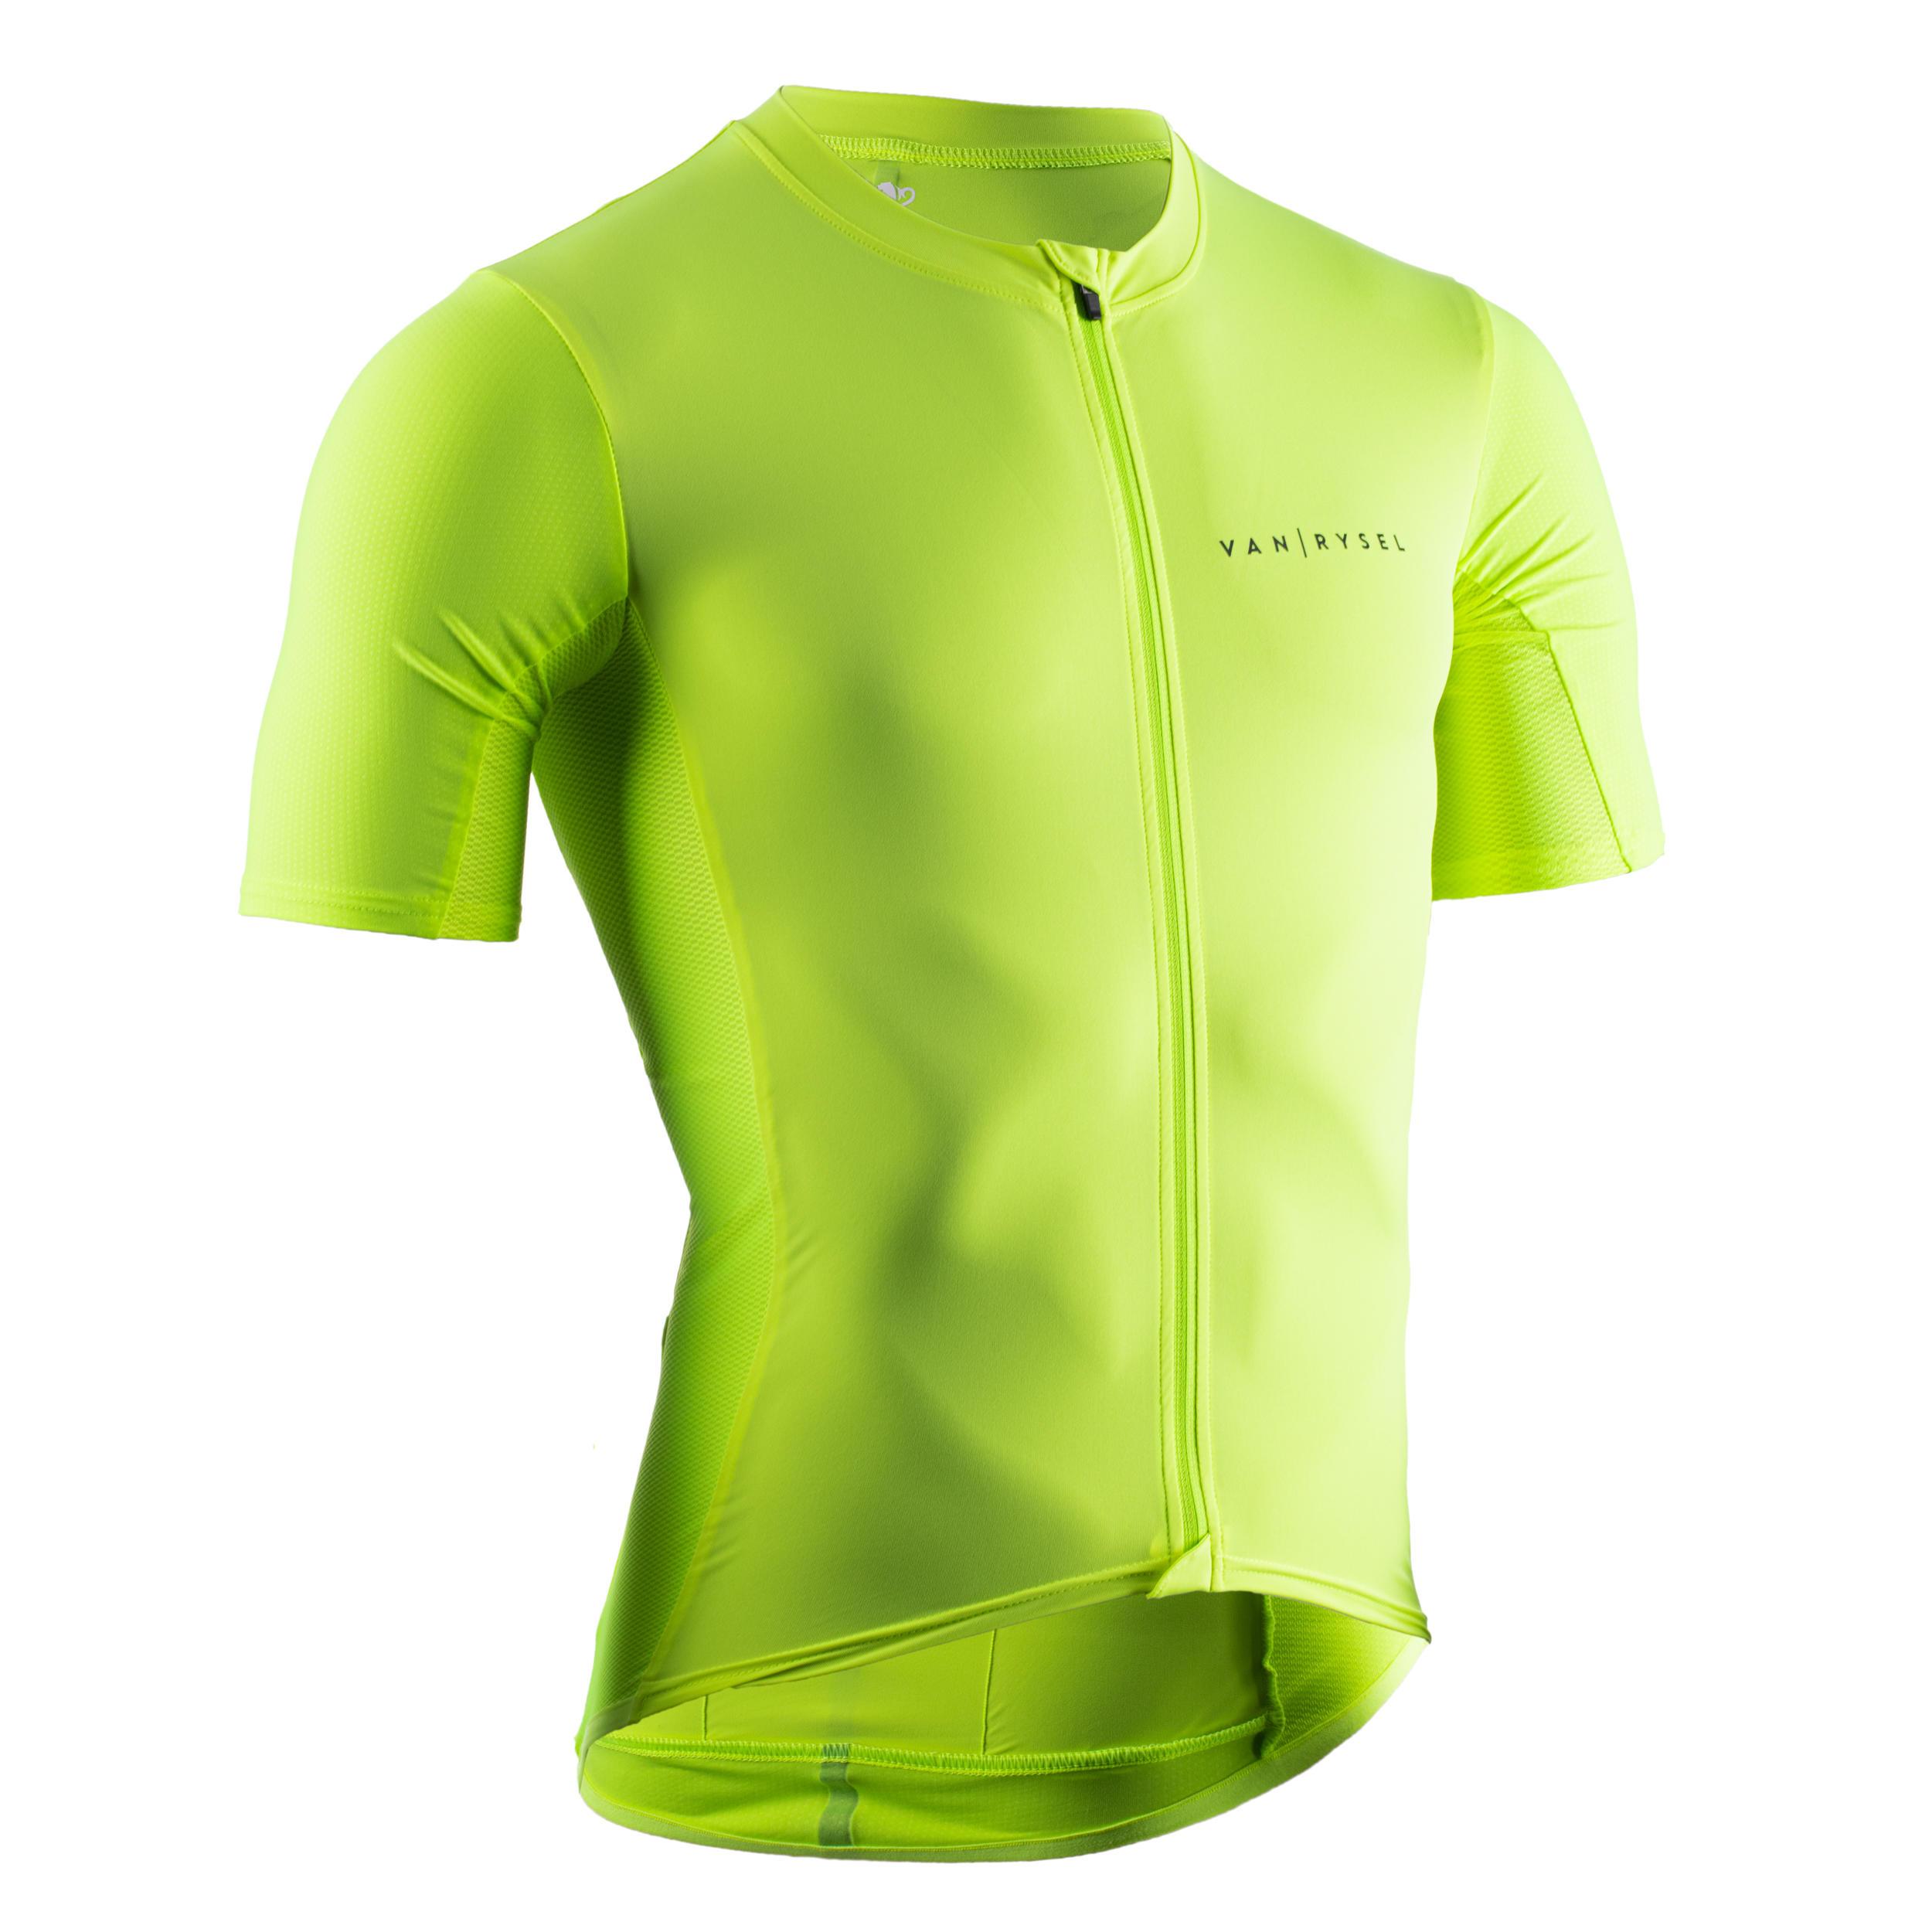 Tricou ciclism NeoRacer